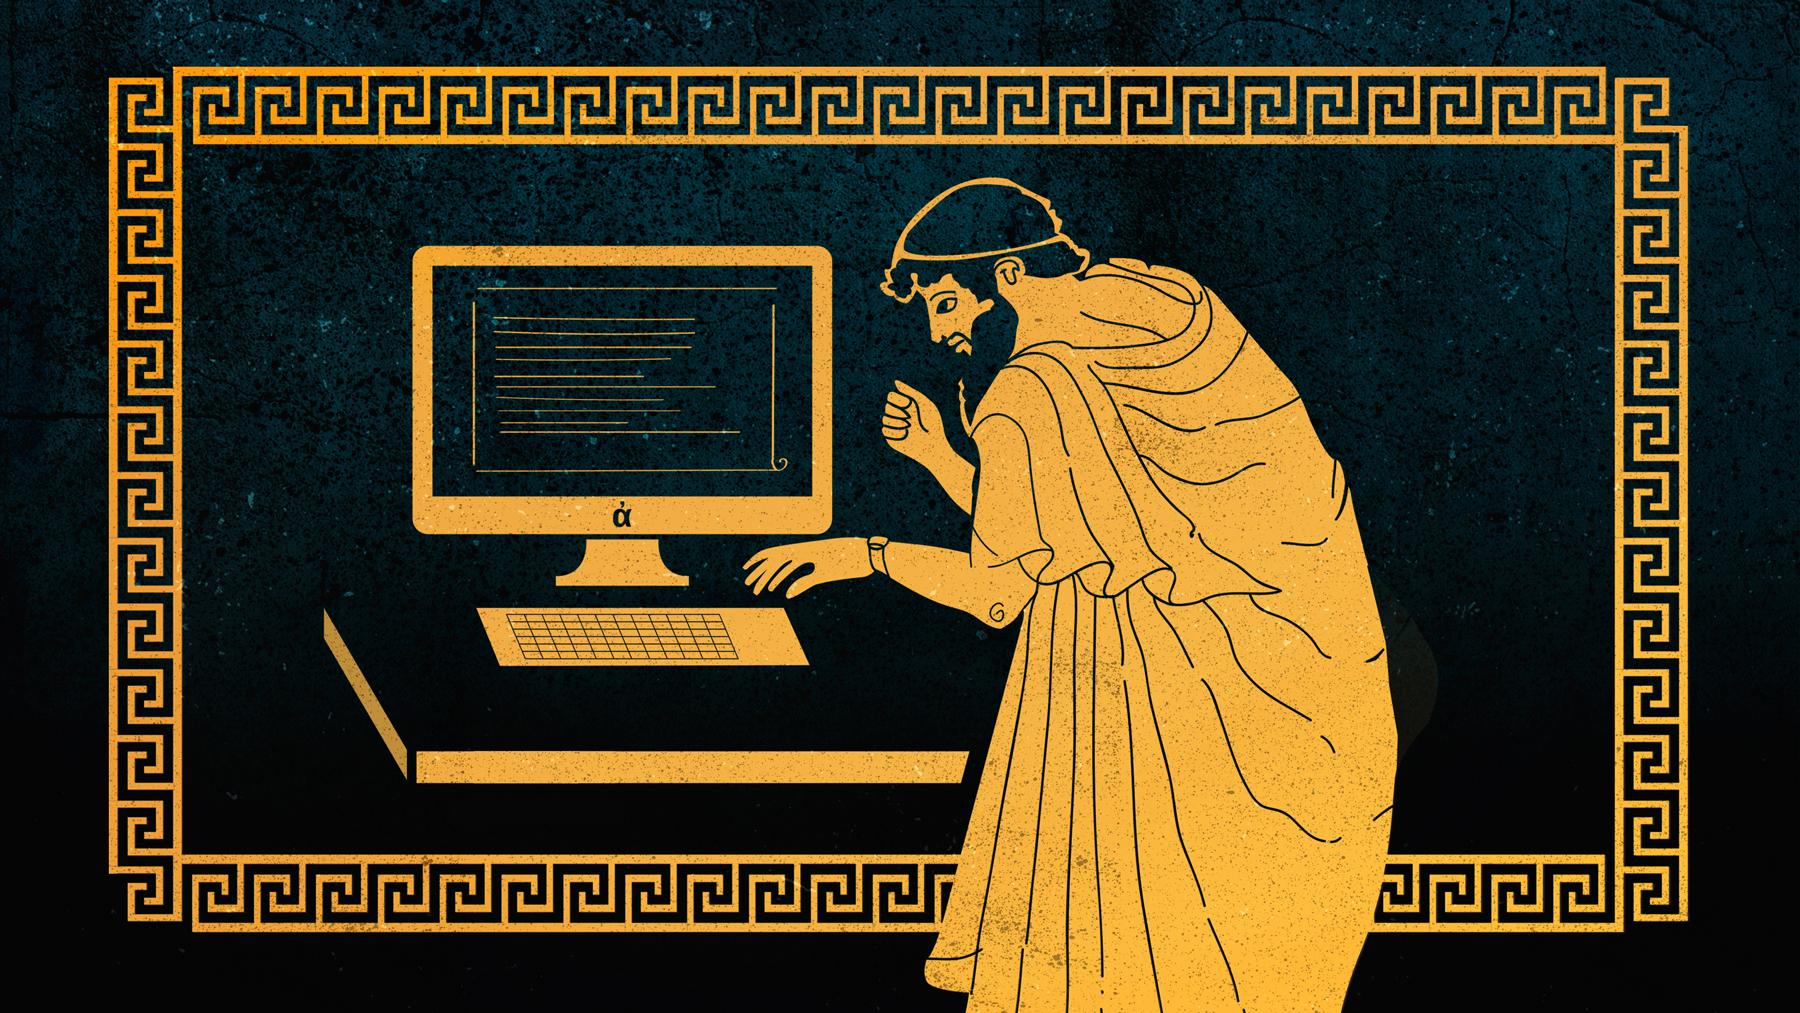 Digital philosophy